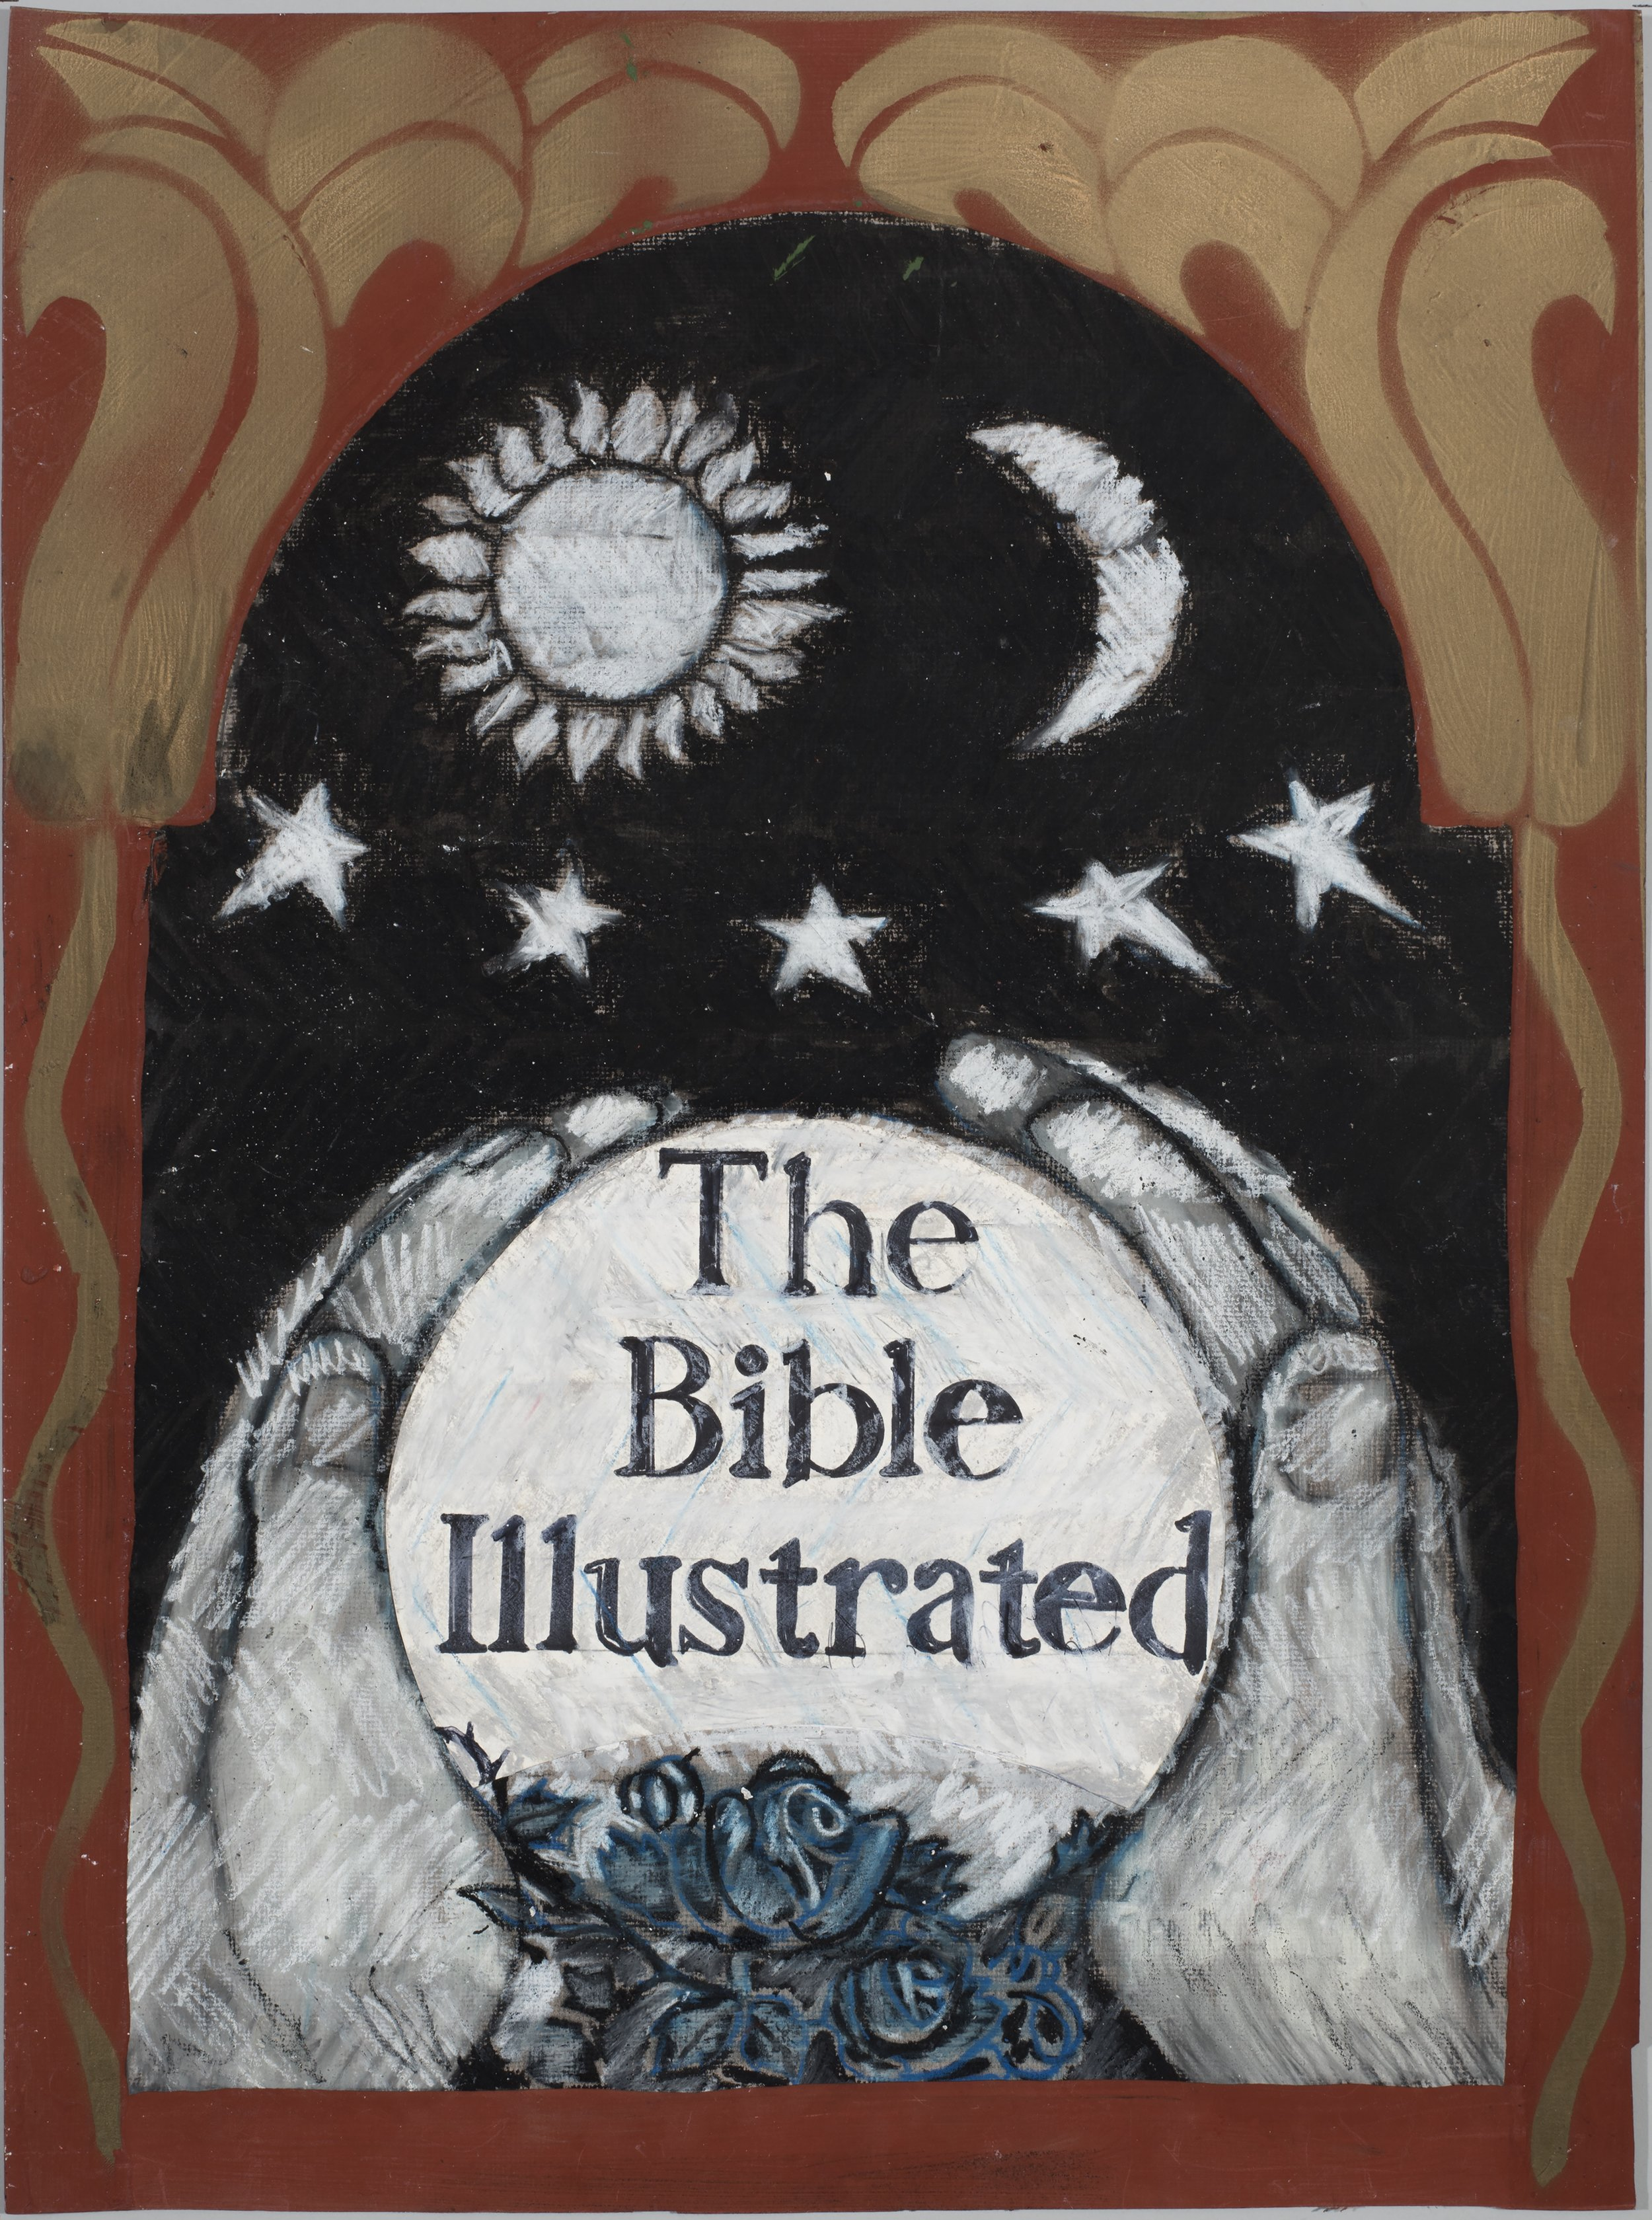 The Bible Illustrated: Stephen Glueckert